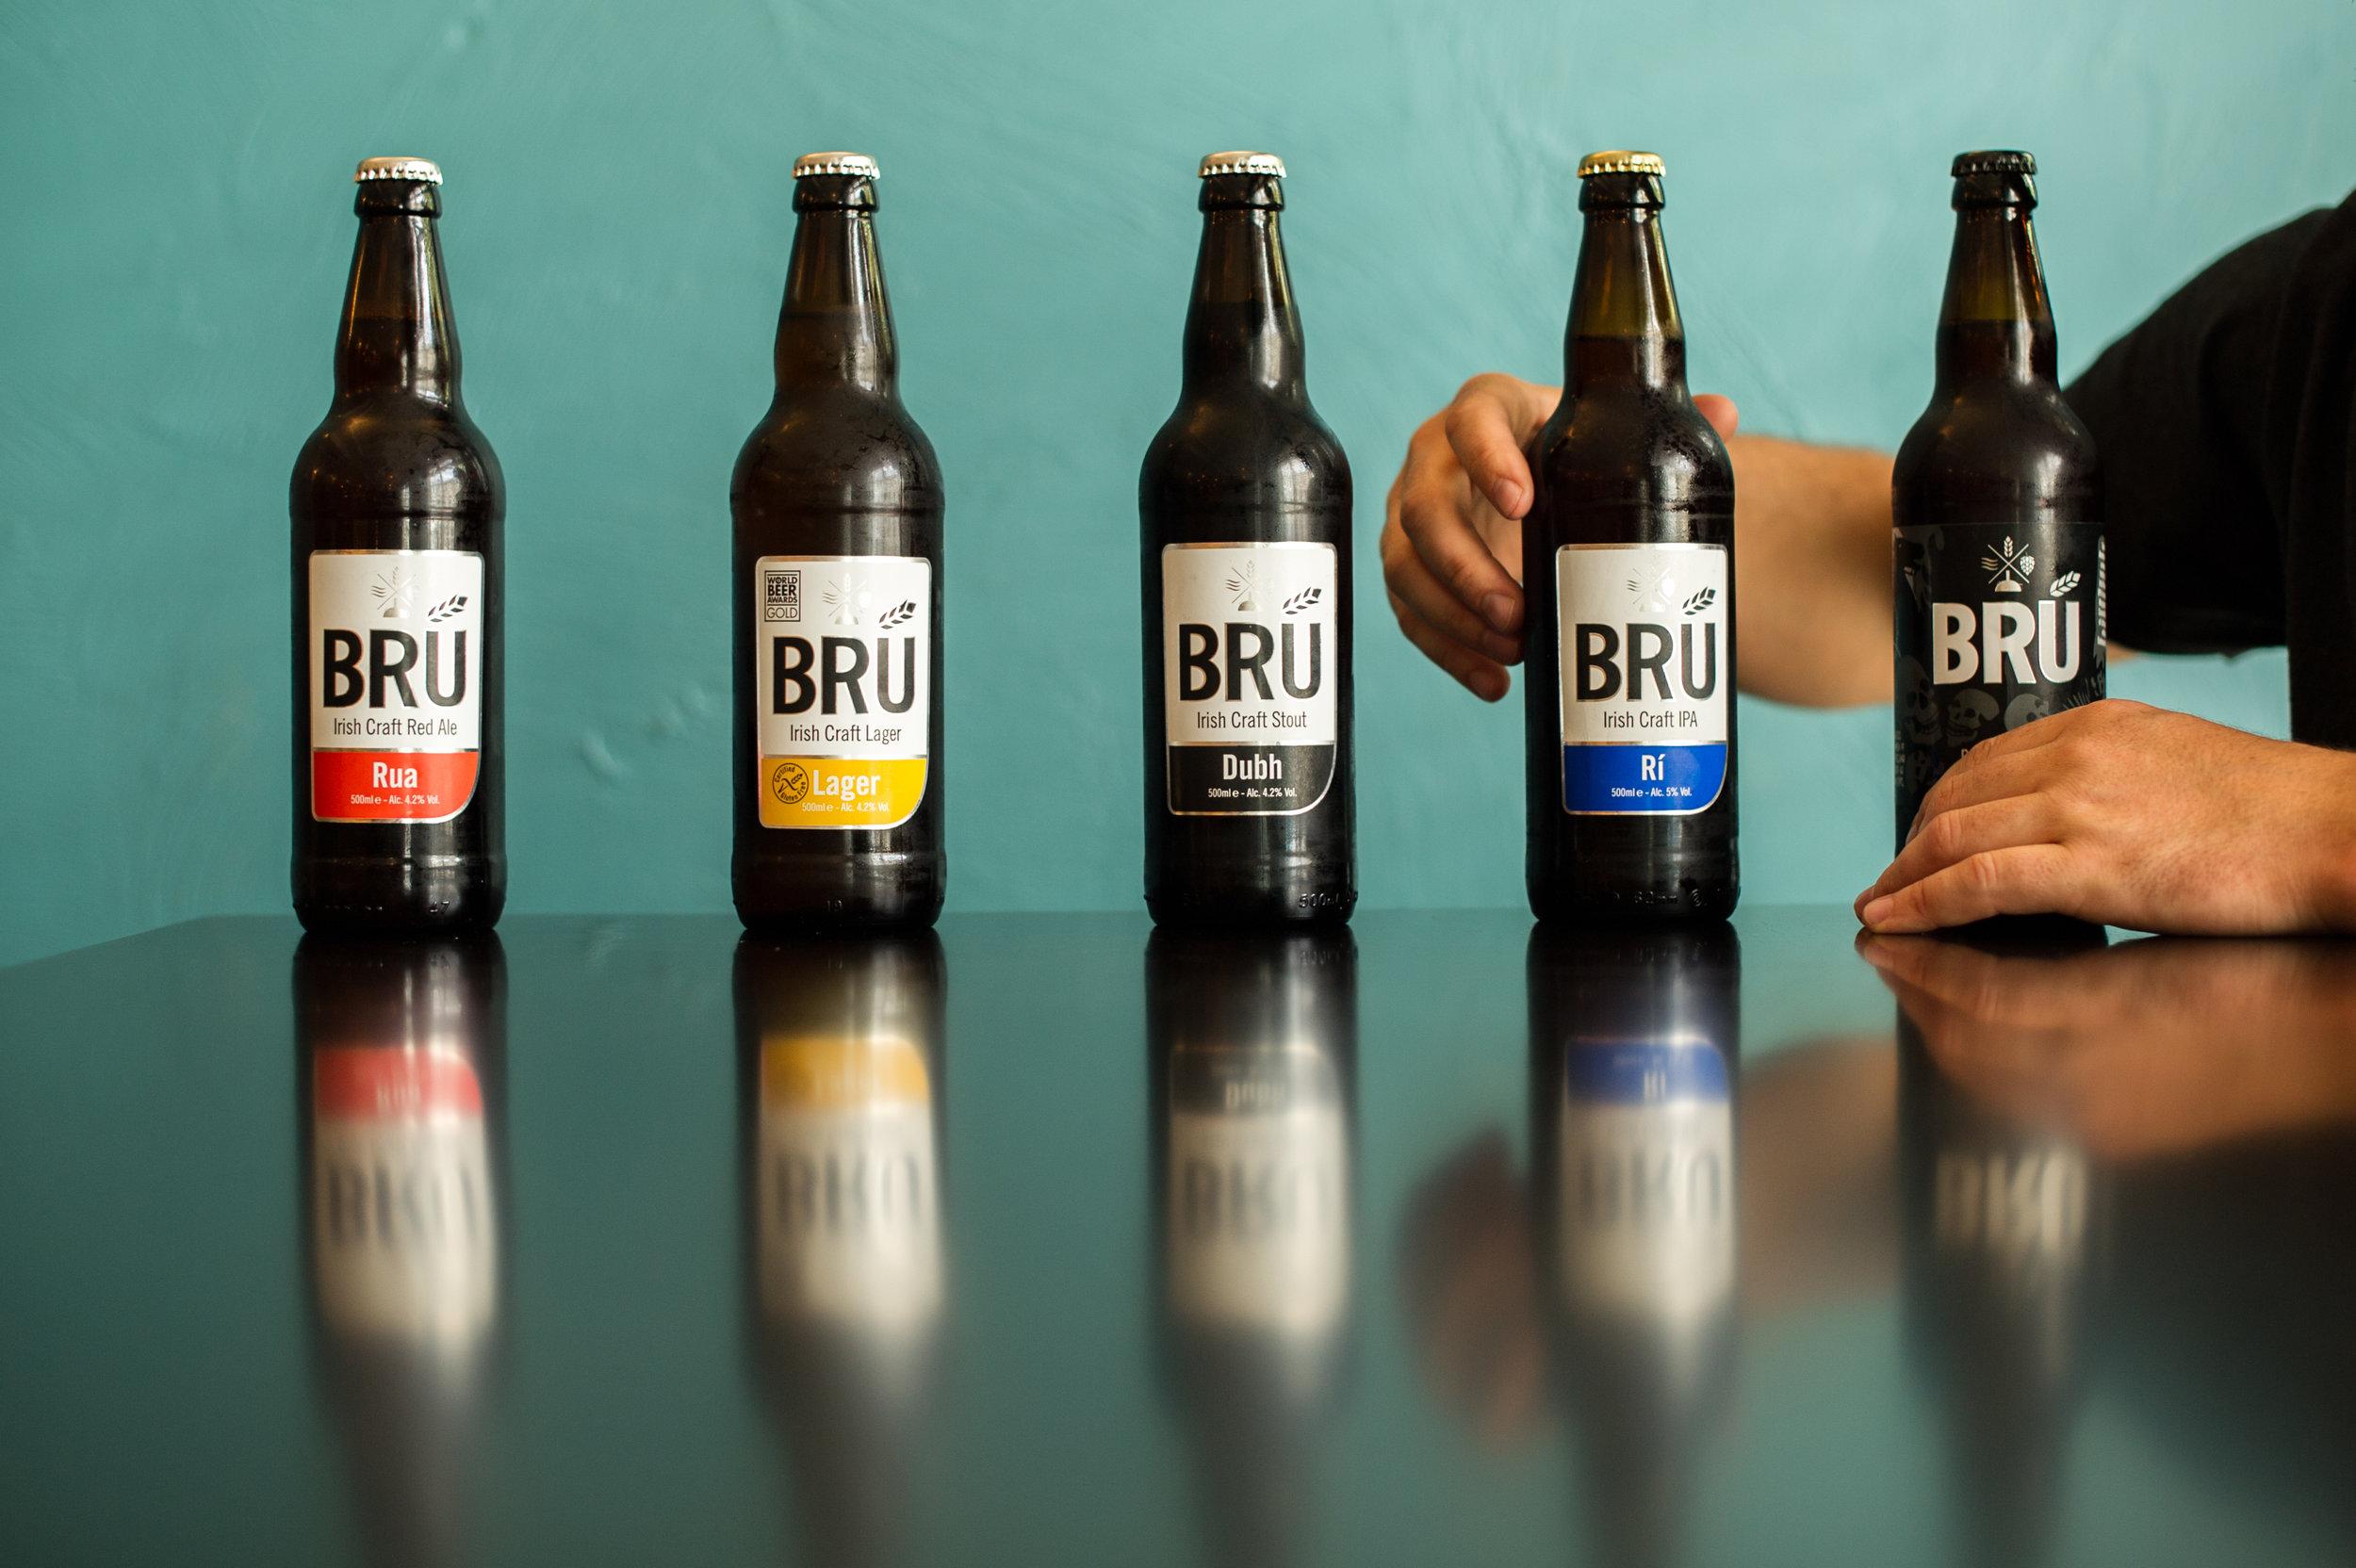 You can find the BRÚ craft beer range in 500ml bottle at selected SuperValu, Centra, Tesco, Spar, EuroSpar, Londis, Aldi & LIDL and independant off licences throughout Ireland and the UK.